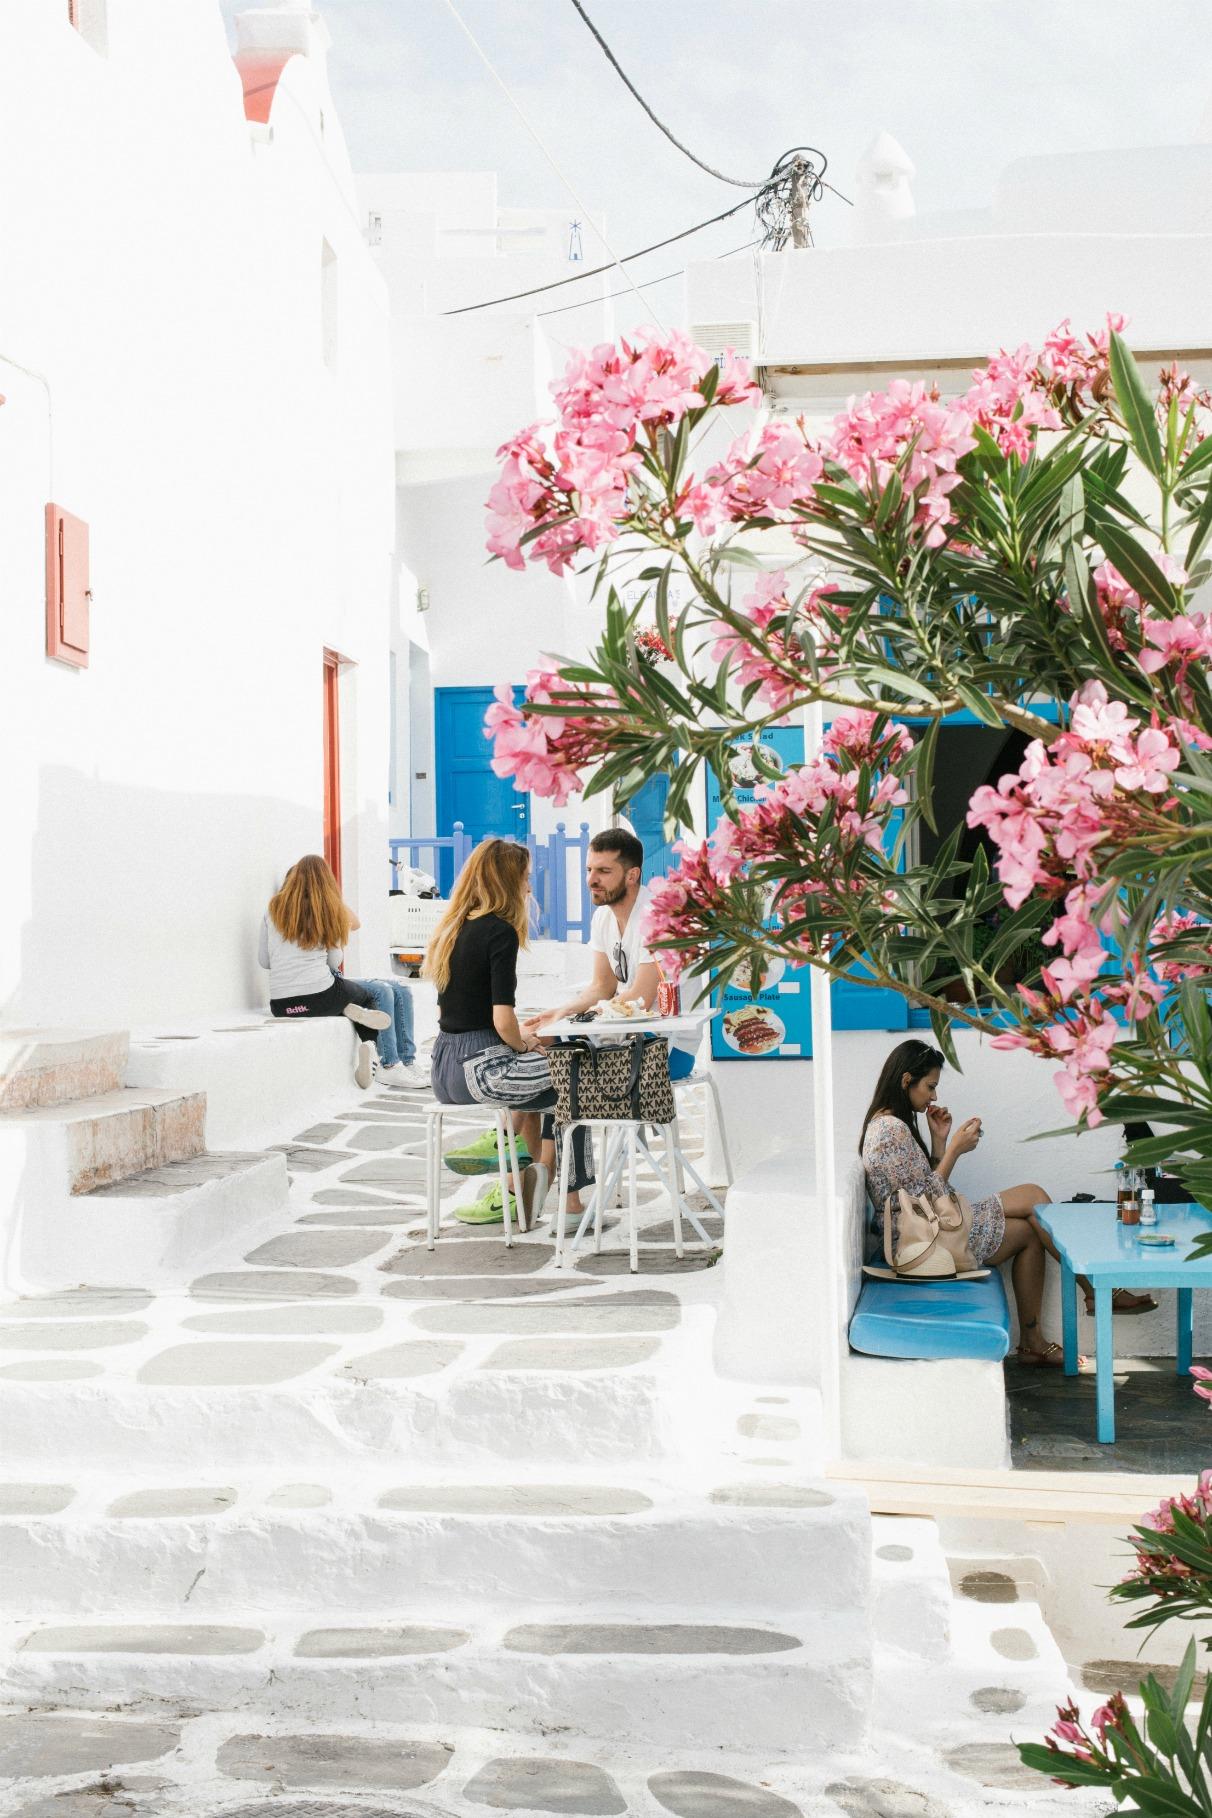 wind-mills-mykonos-town-2016-holidays-vacay-disi-couture-lemon-print-dress-40